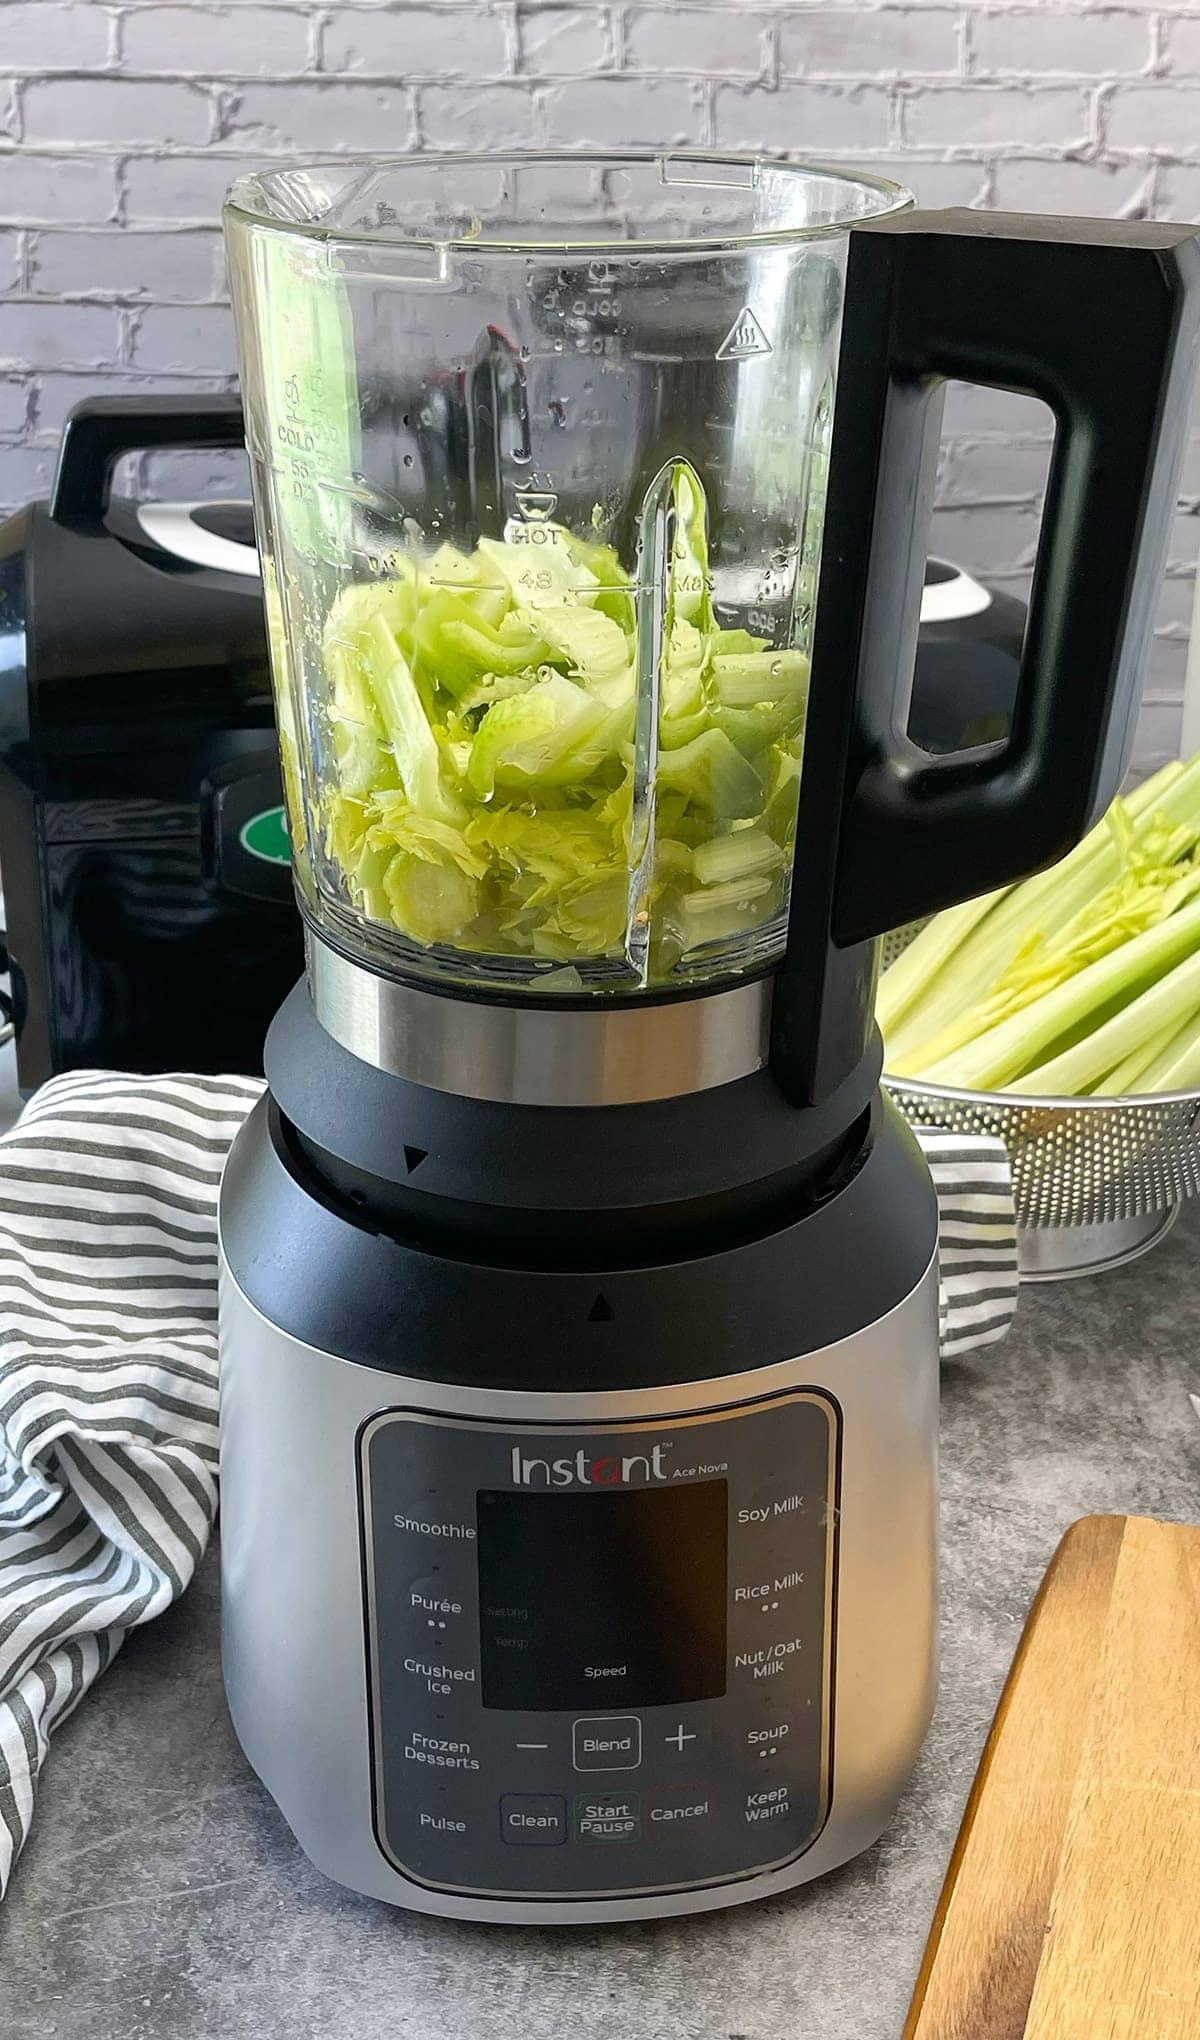 celery juice in the blender